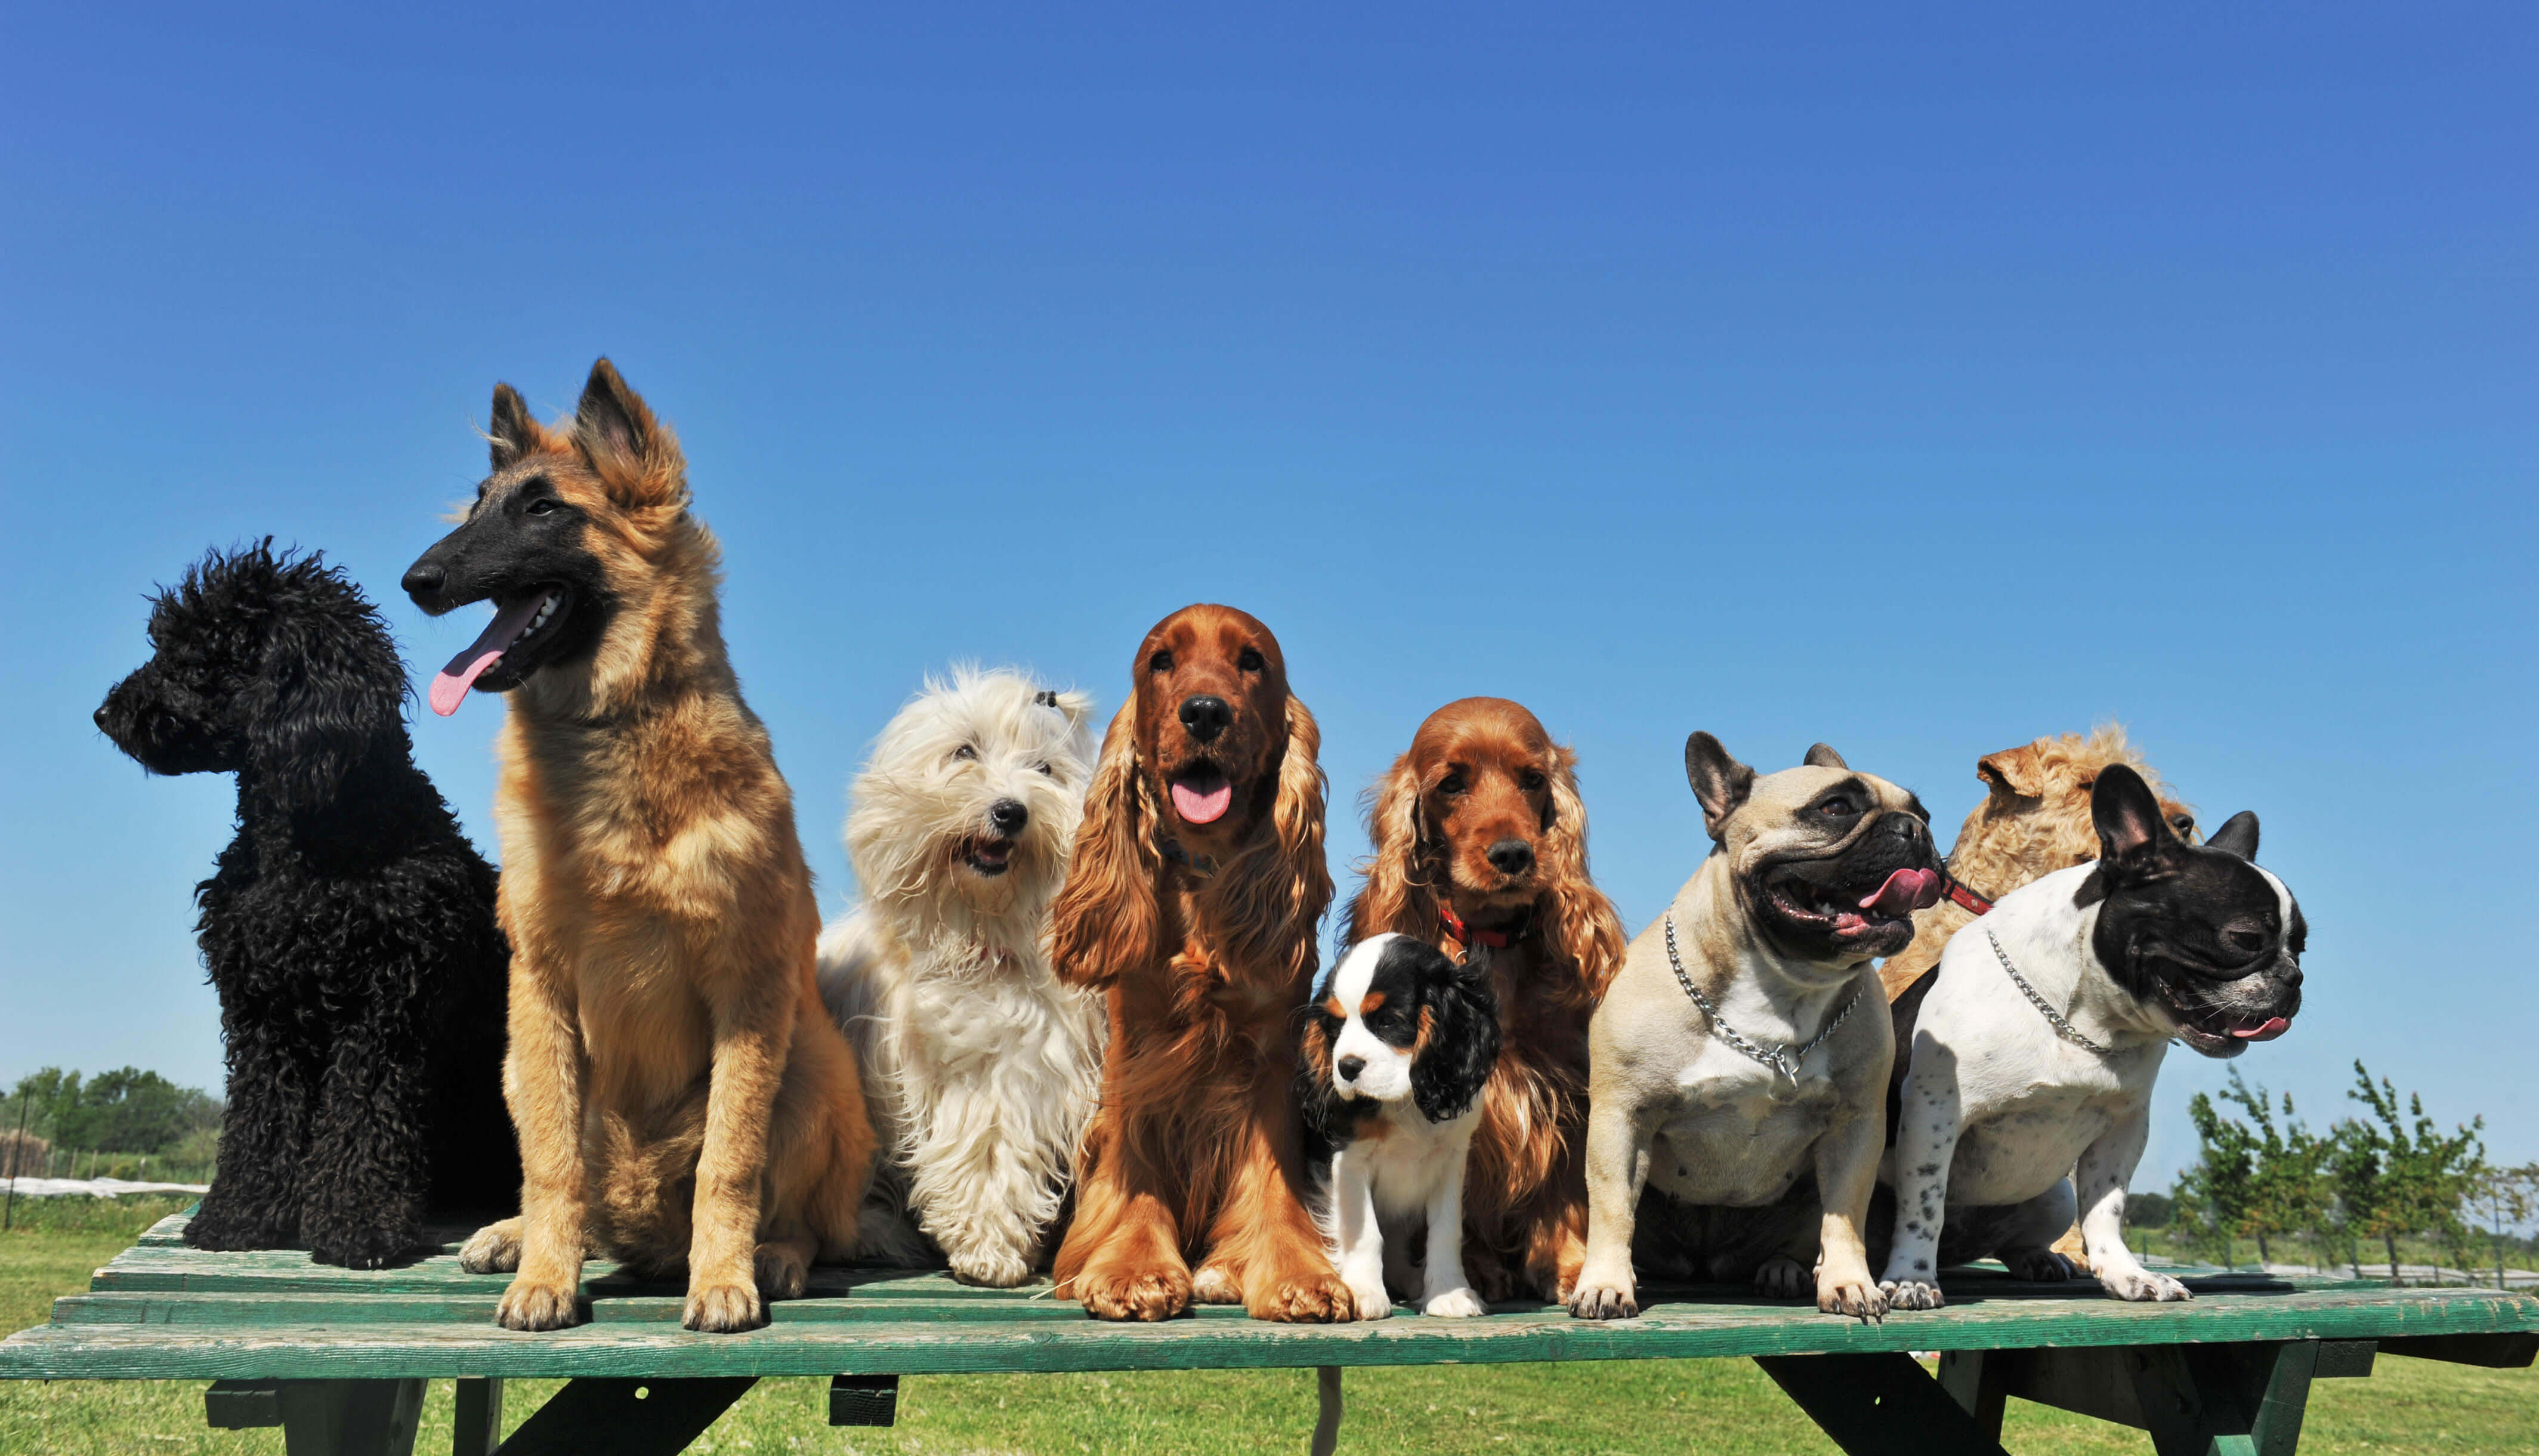 10 Trending Dog Breeds of 2019